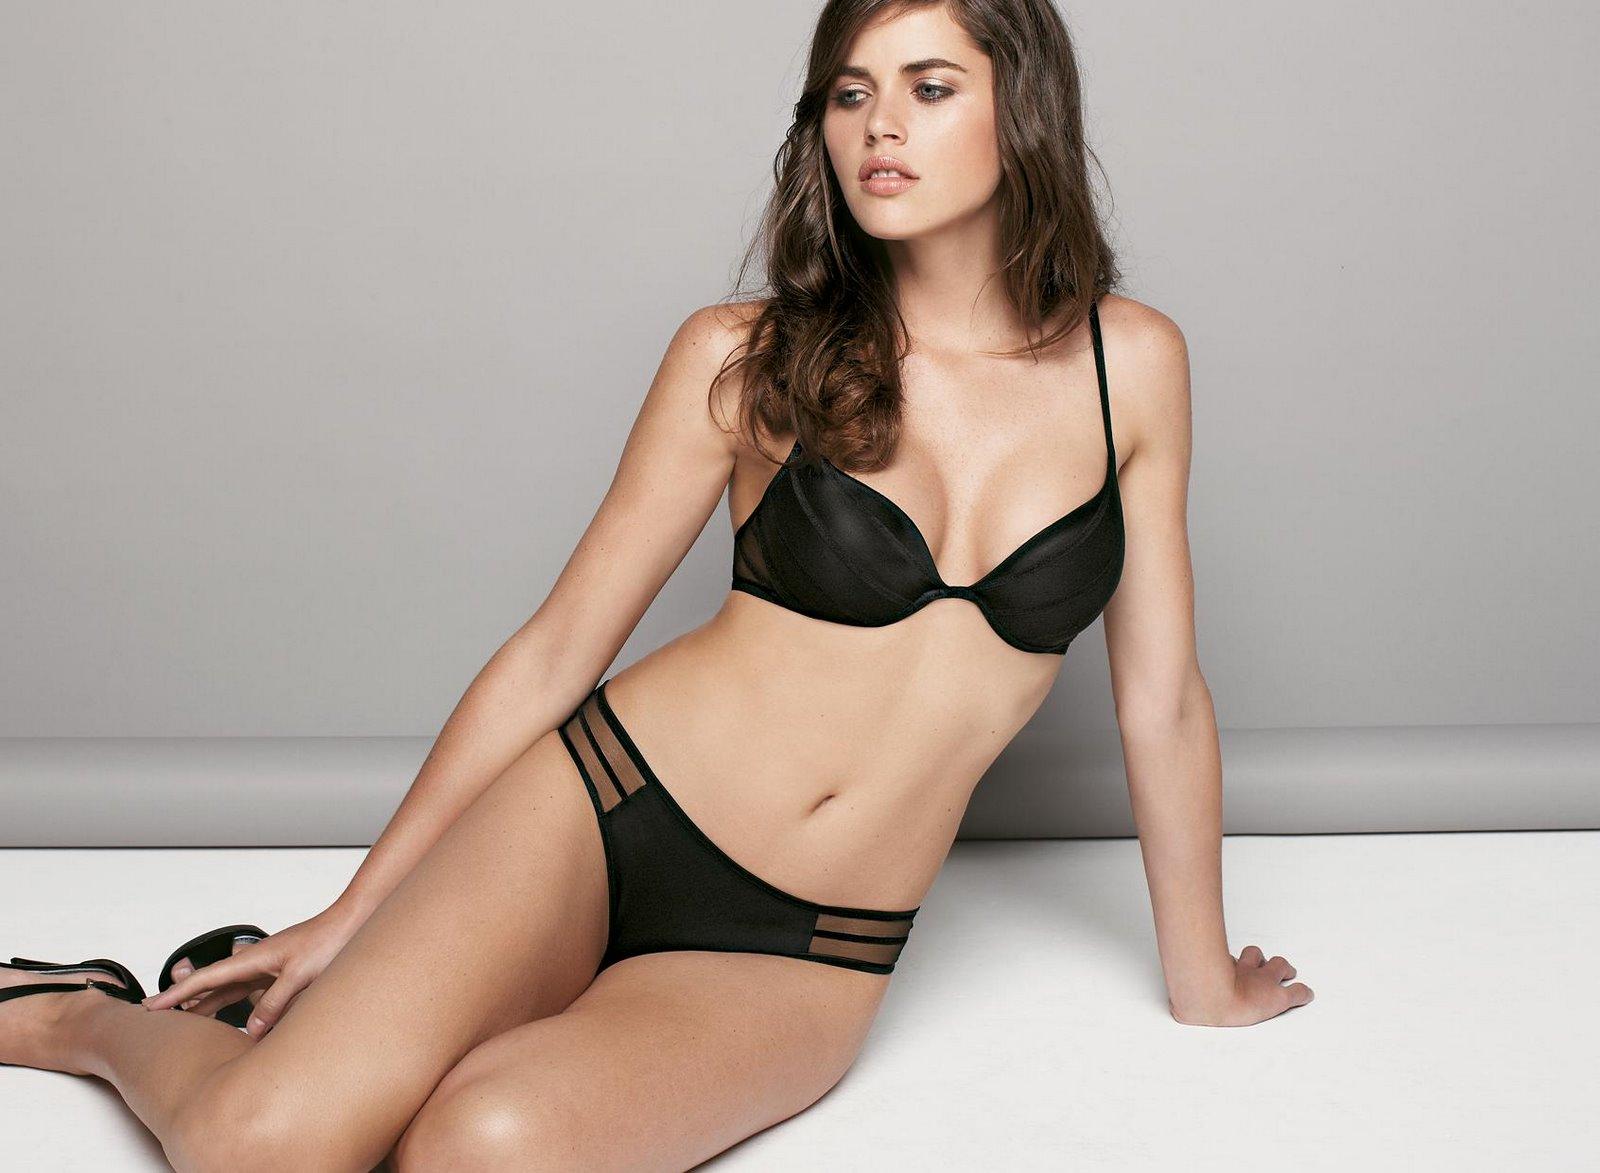 Zoe Duchesne en lingerie